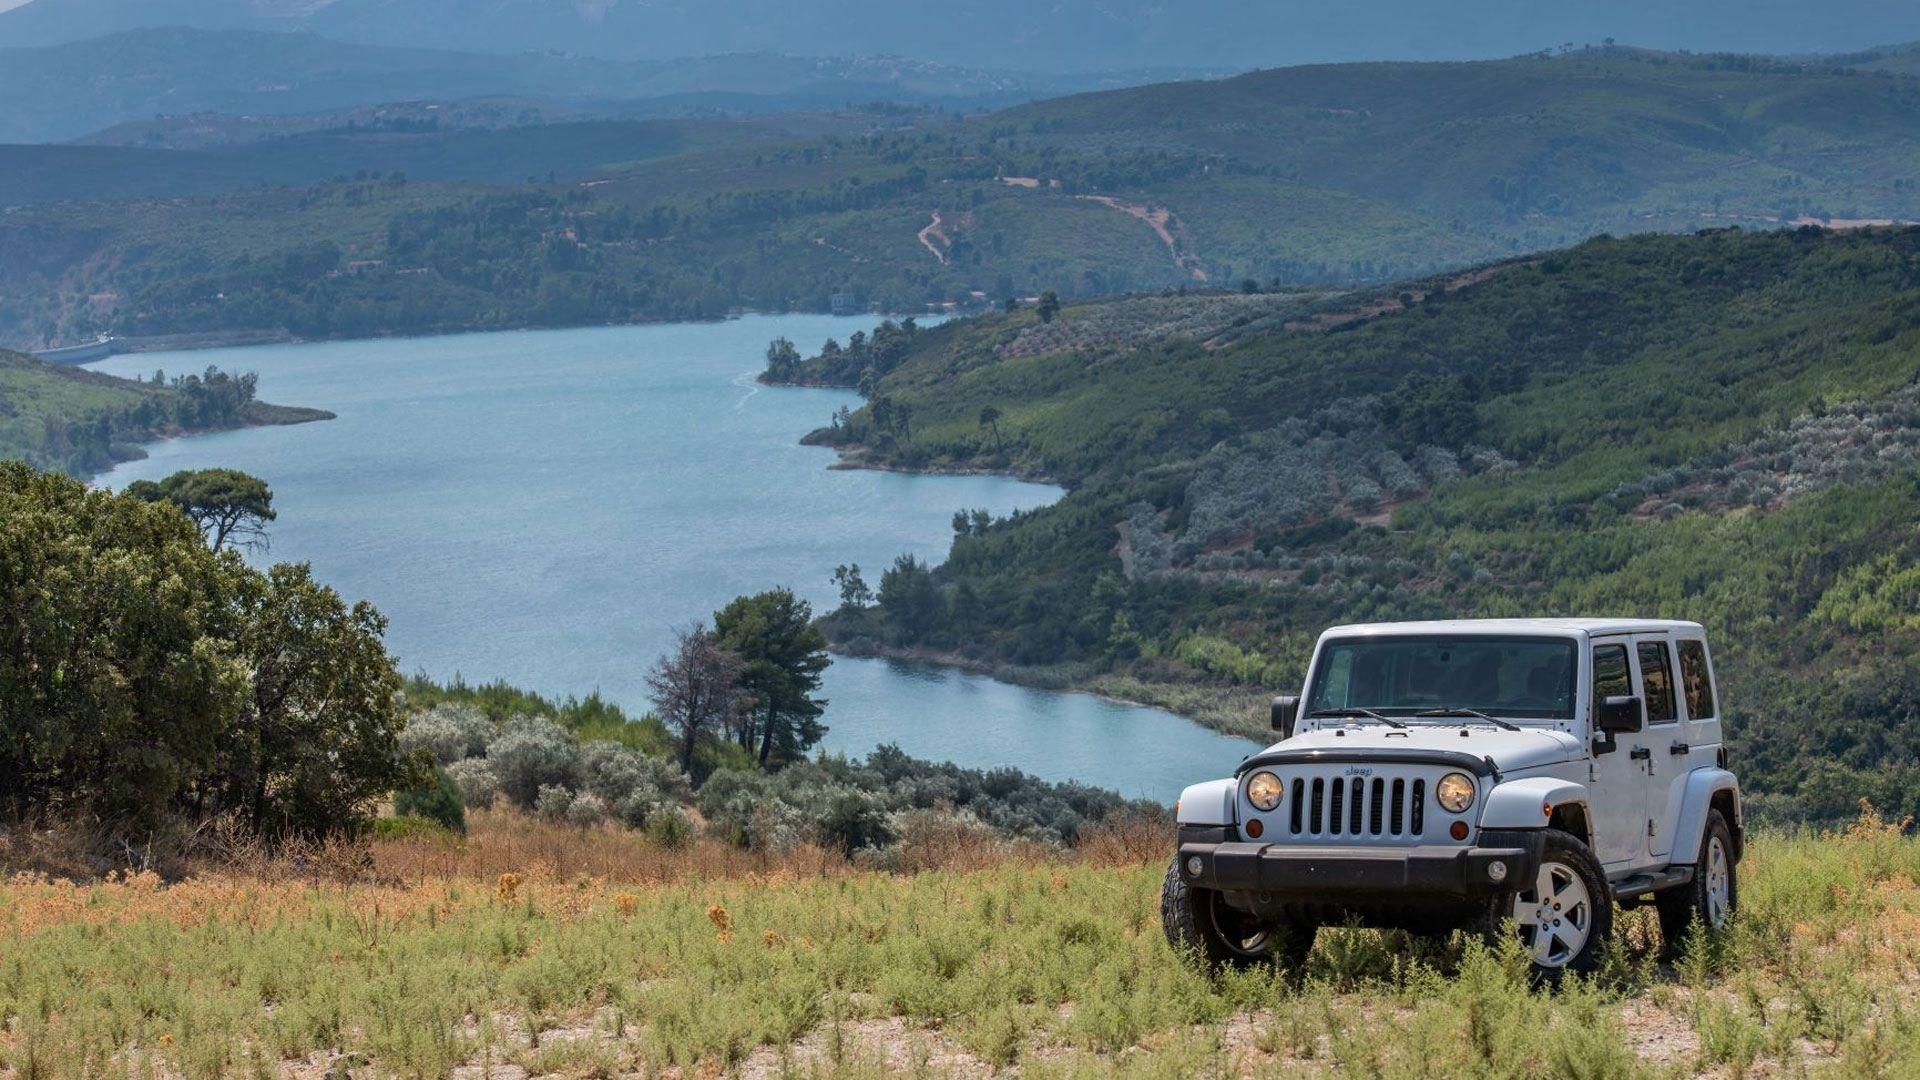 Tours in Athens - 4x4 Jeep Tour